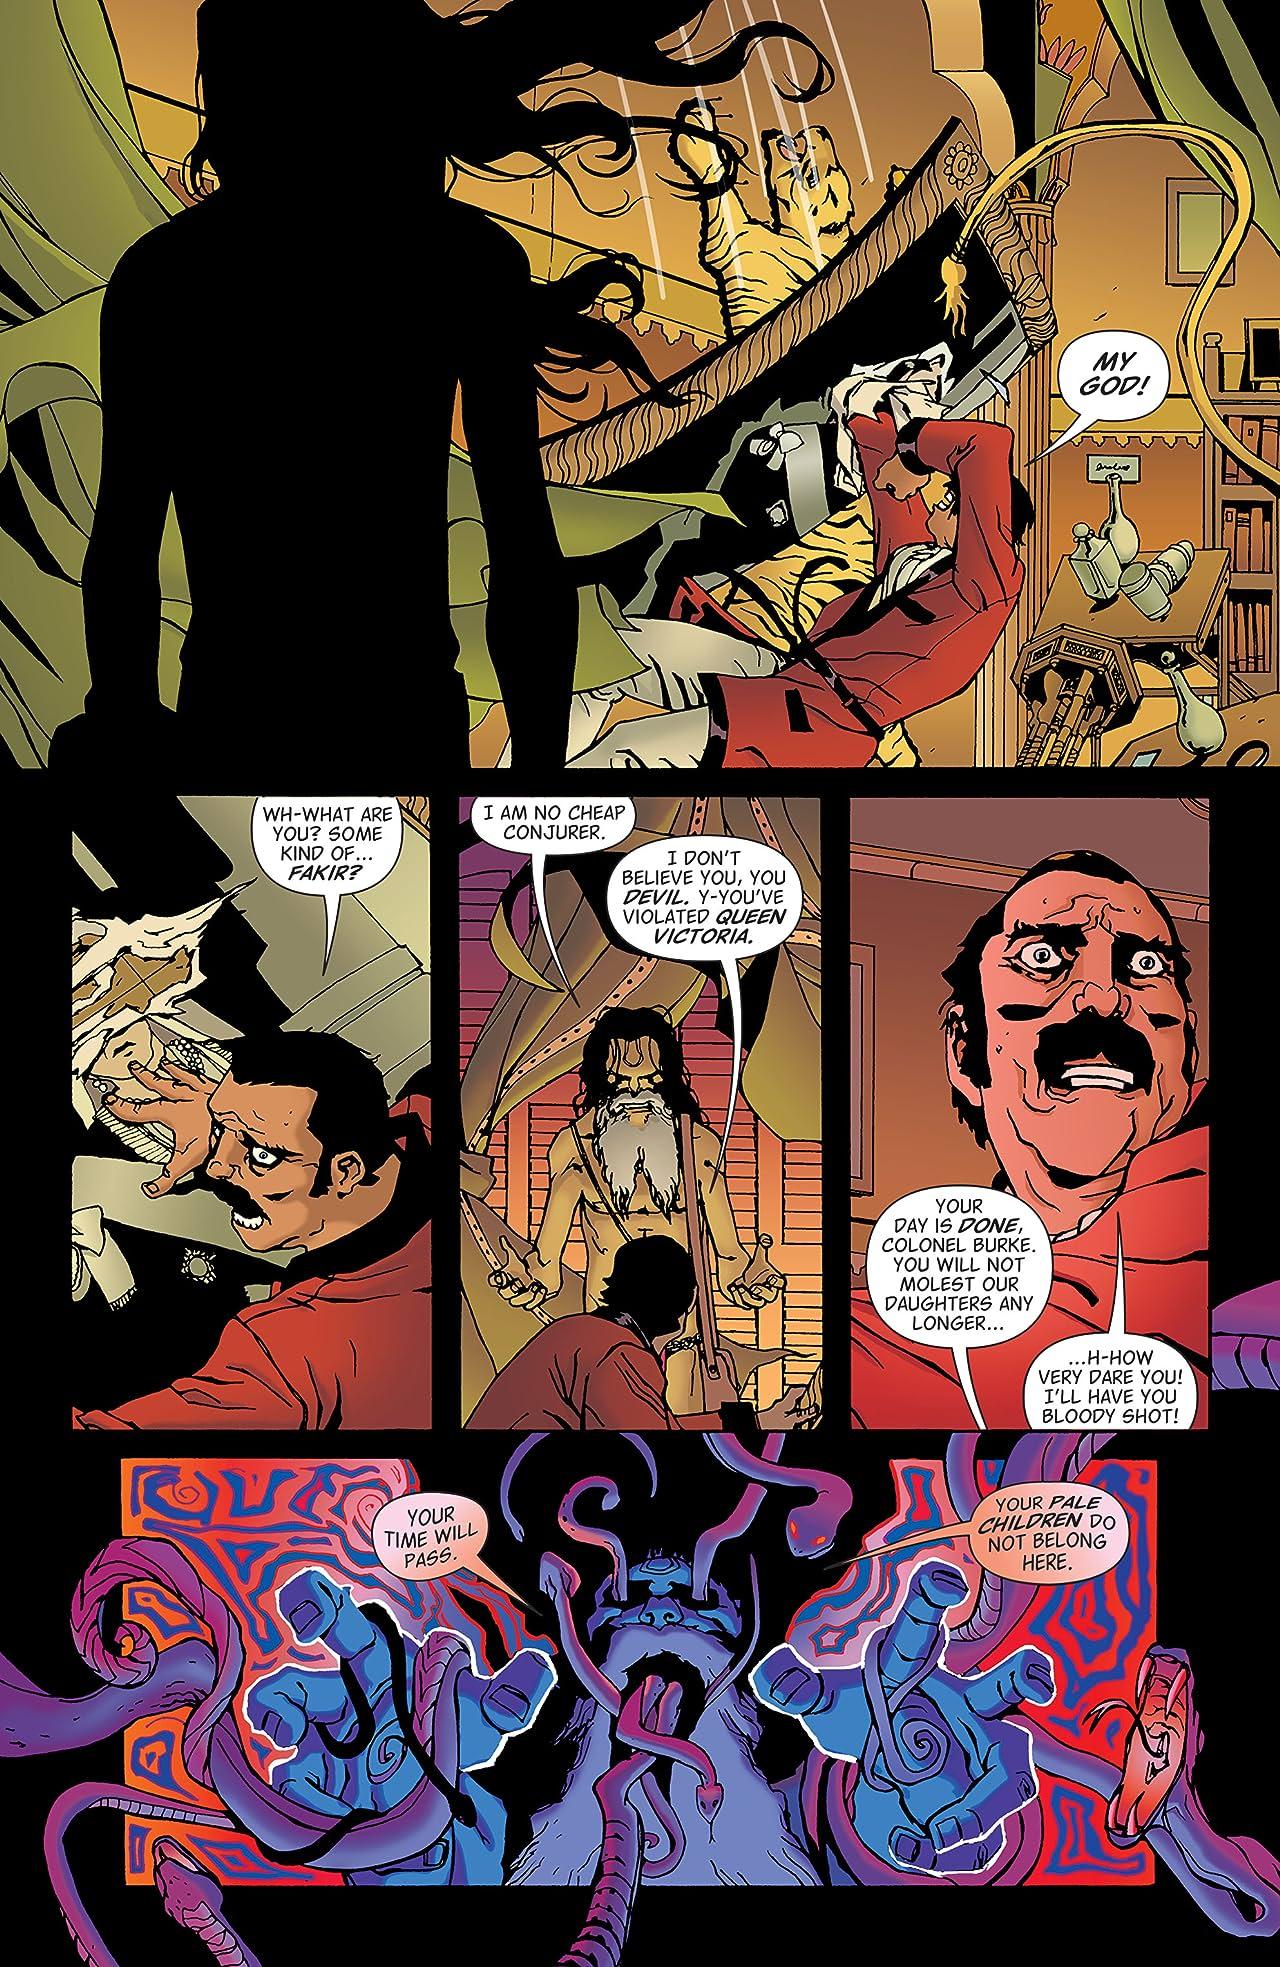 John Constantine, Hellblazer Vol. 23: No Future